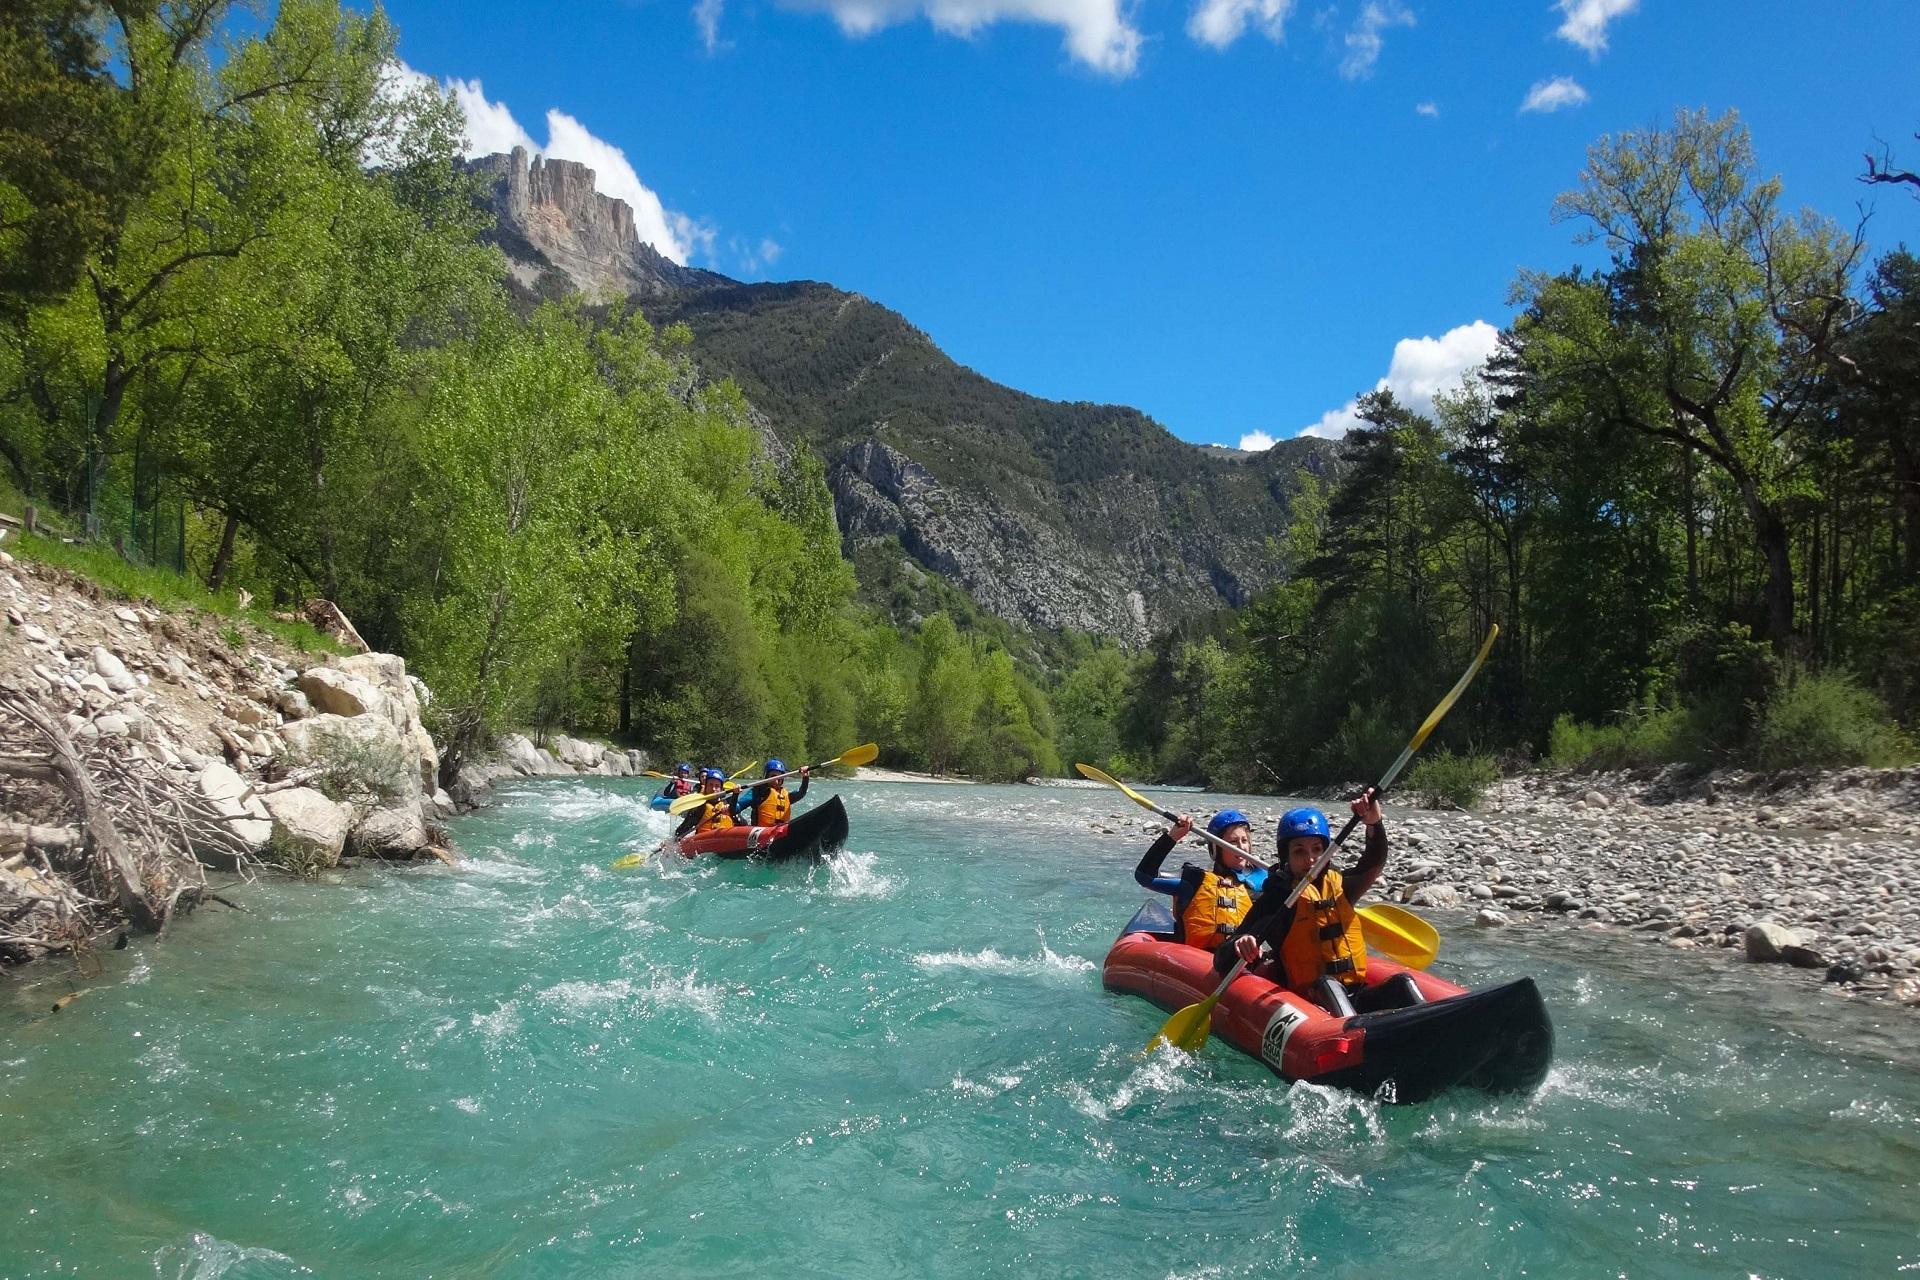 Gorges-du-Verdon-La-Palud-canoe-rafting